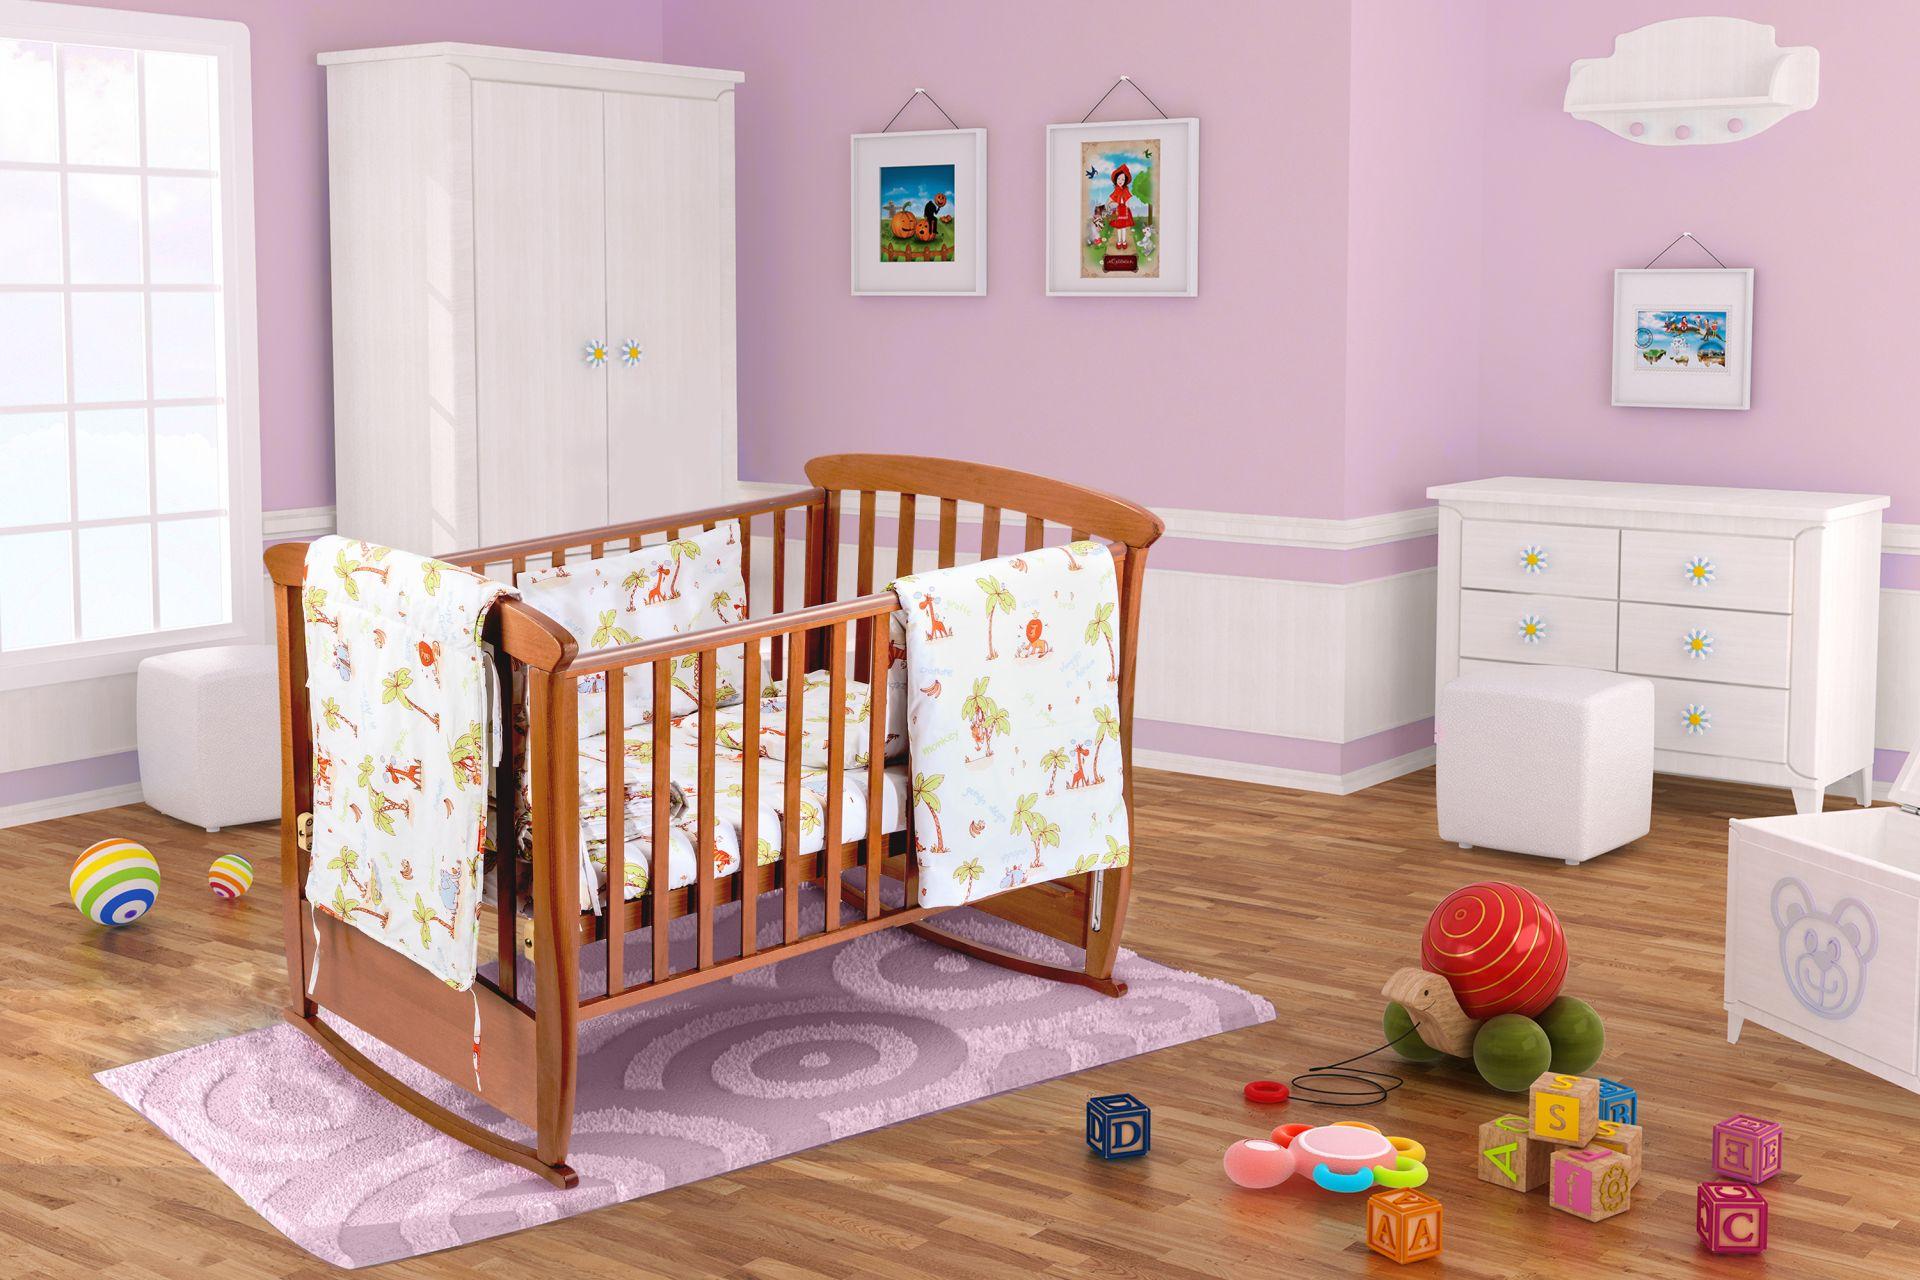 Set patut bebe, cearceaf cu elastic pentru saltea 60x120x10, pernuta 37×55, pilota 100×105, aparatori 180x45, model Jungle imagine 2021 somnart.ro